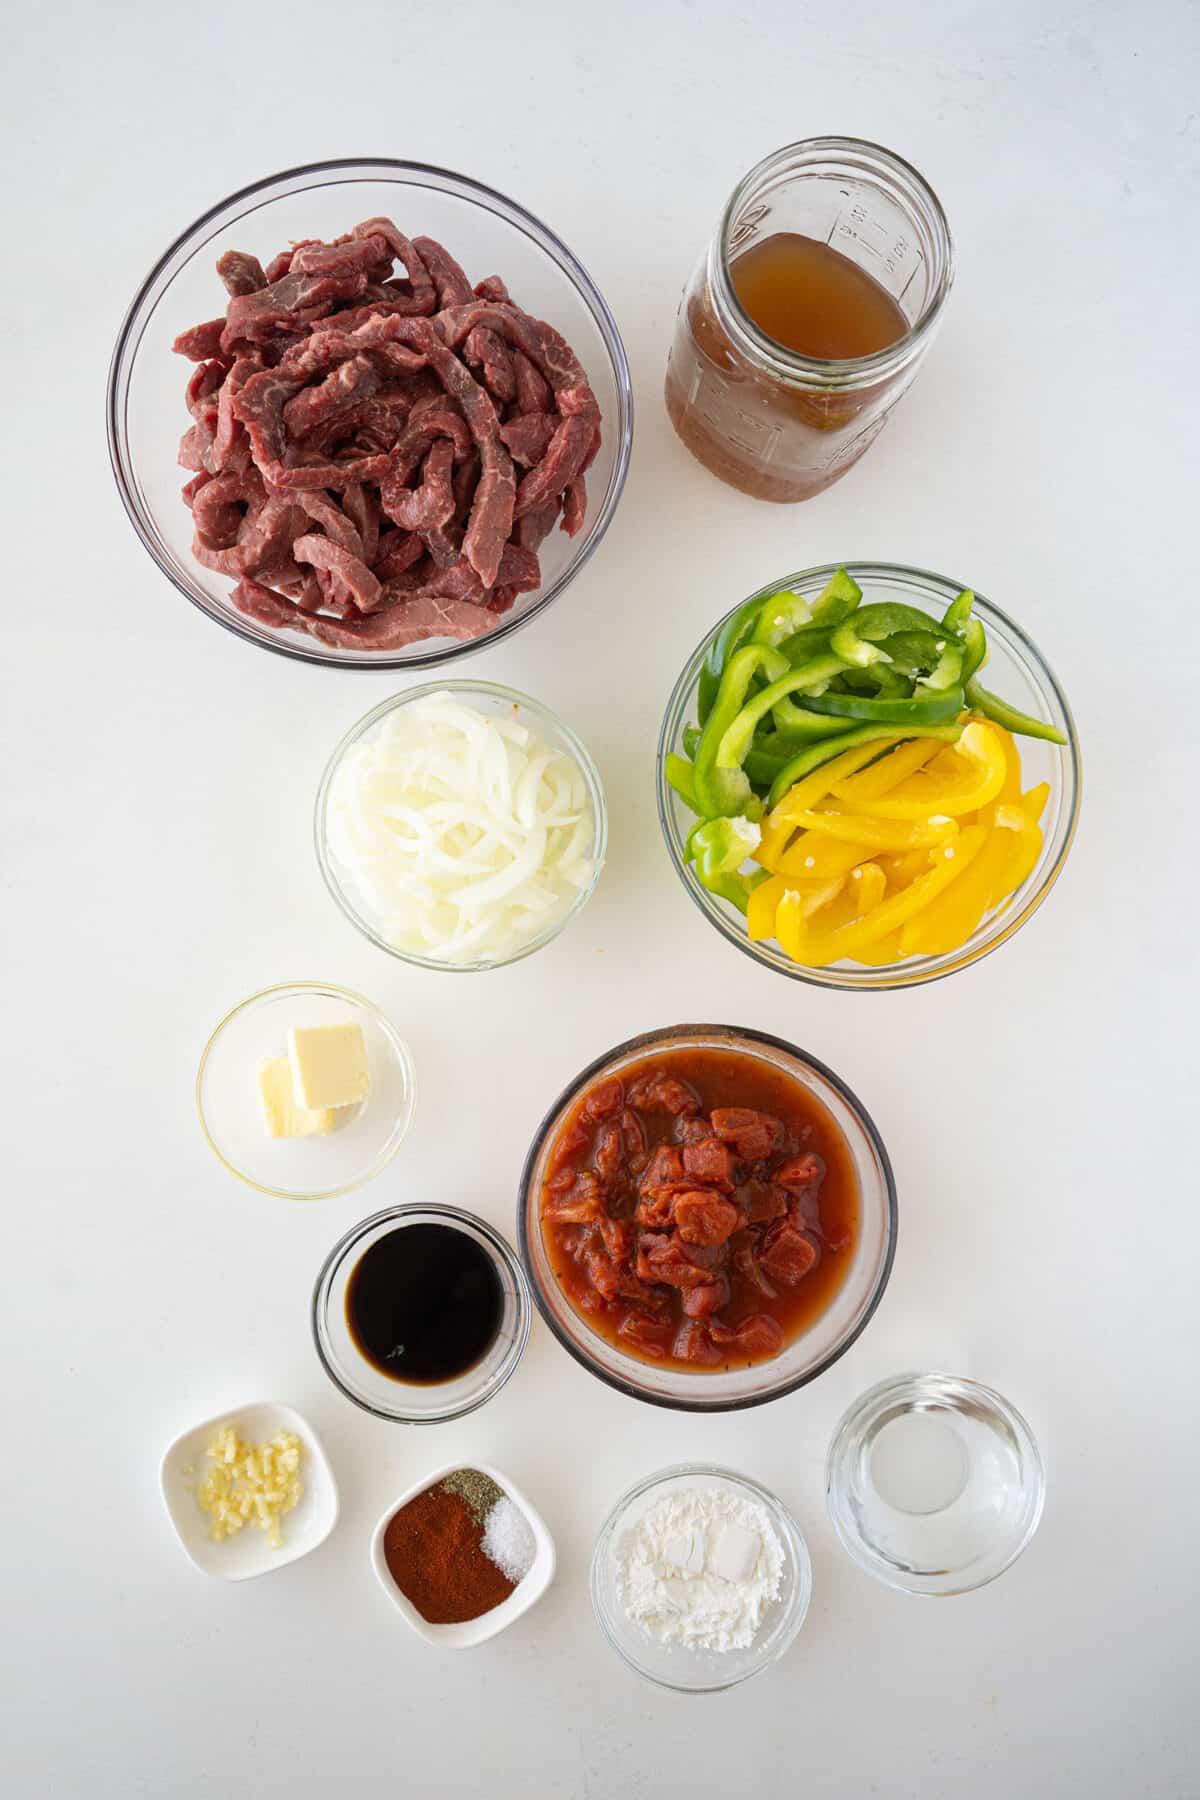 ingredients for pepper steak